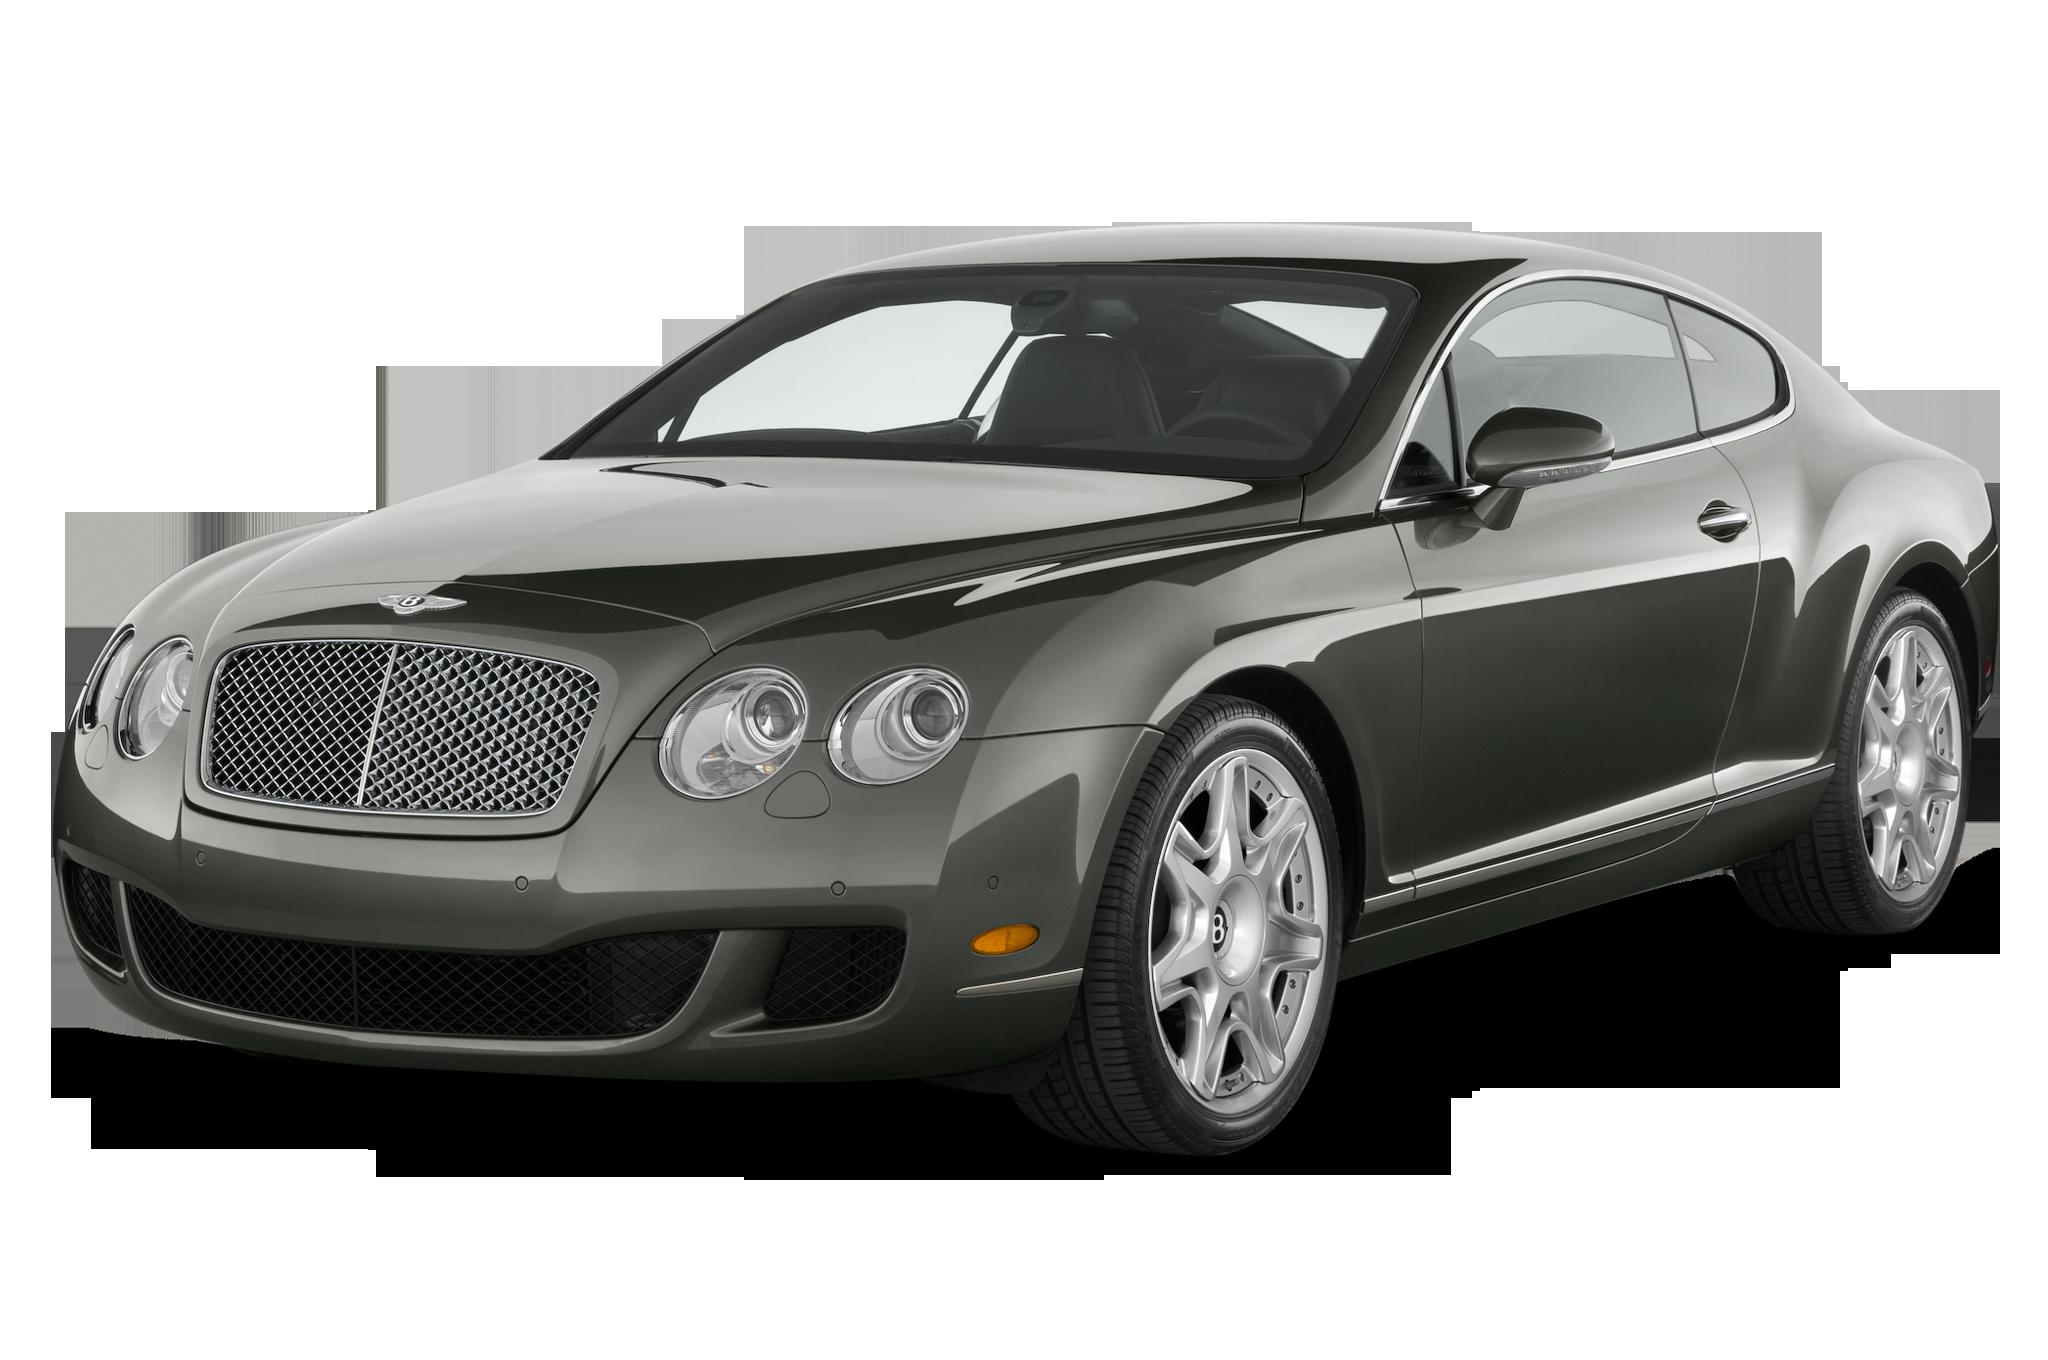 2010 bentley continental gt pricing msn autos. Black Bedroom Furniture Sets. Home Design Ideas